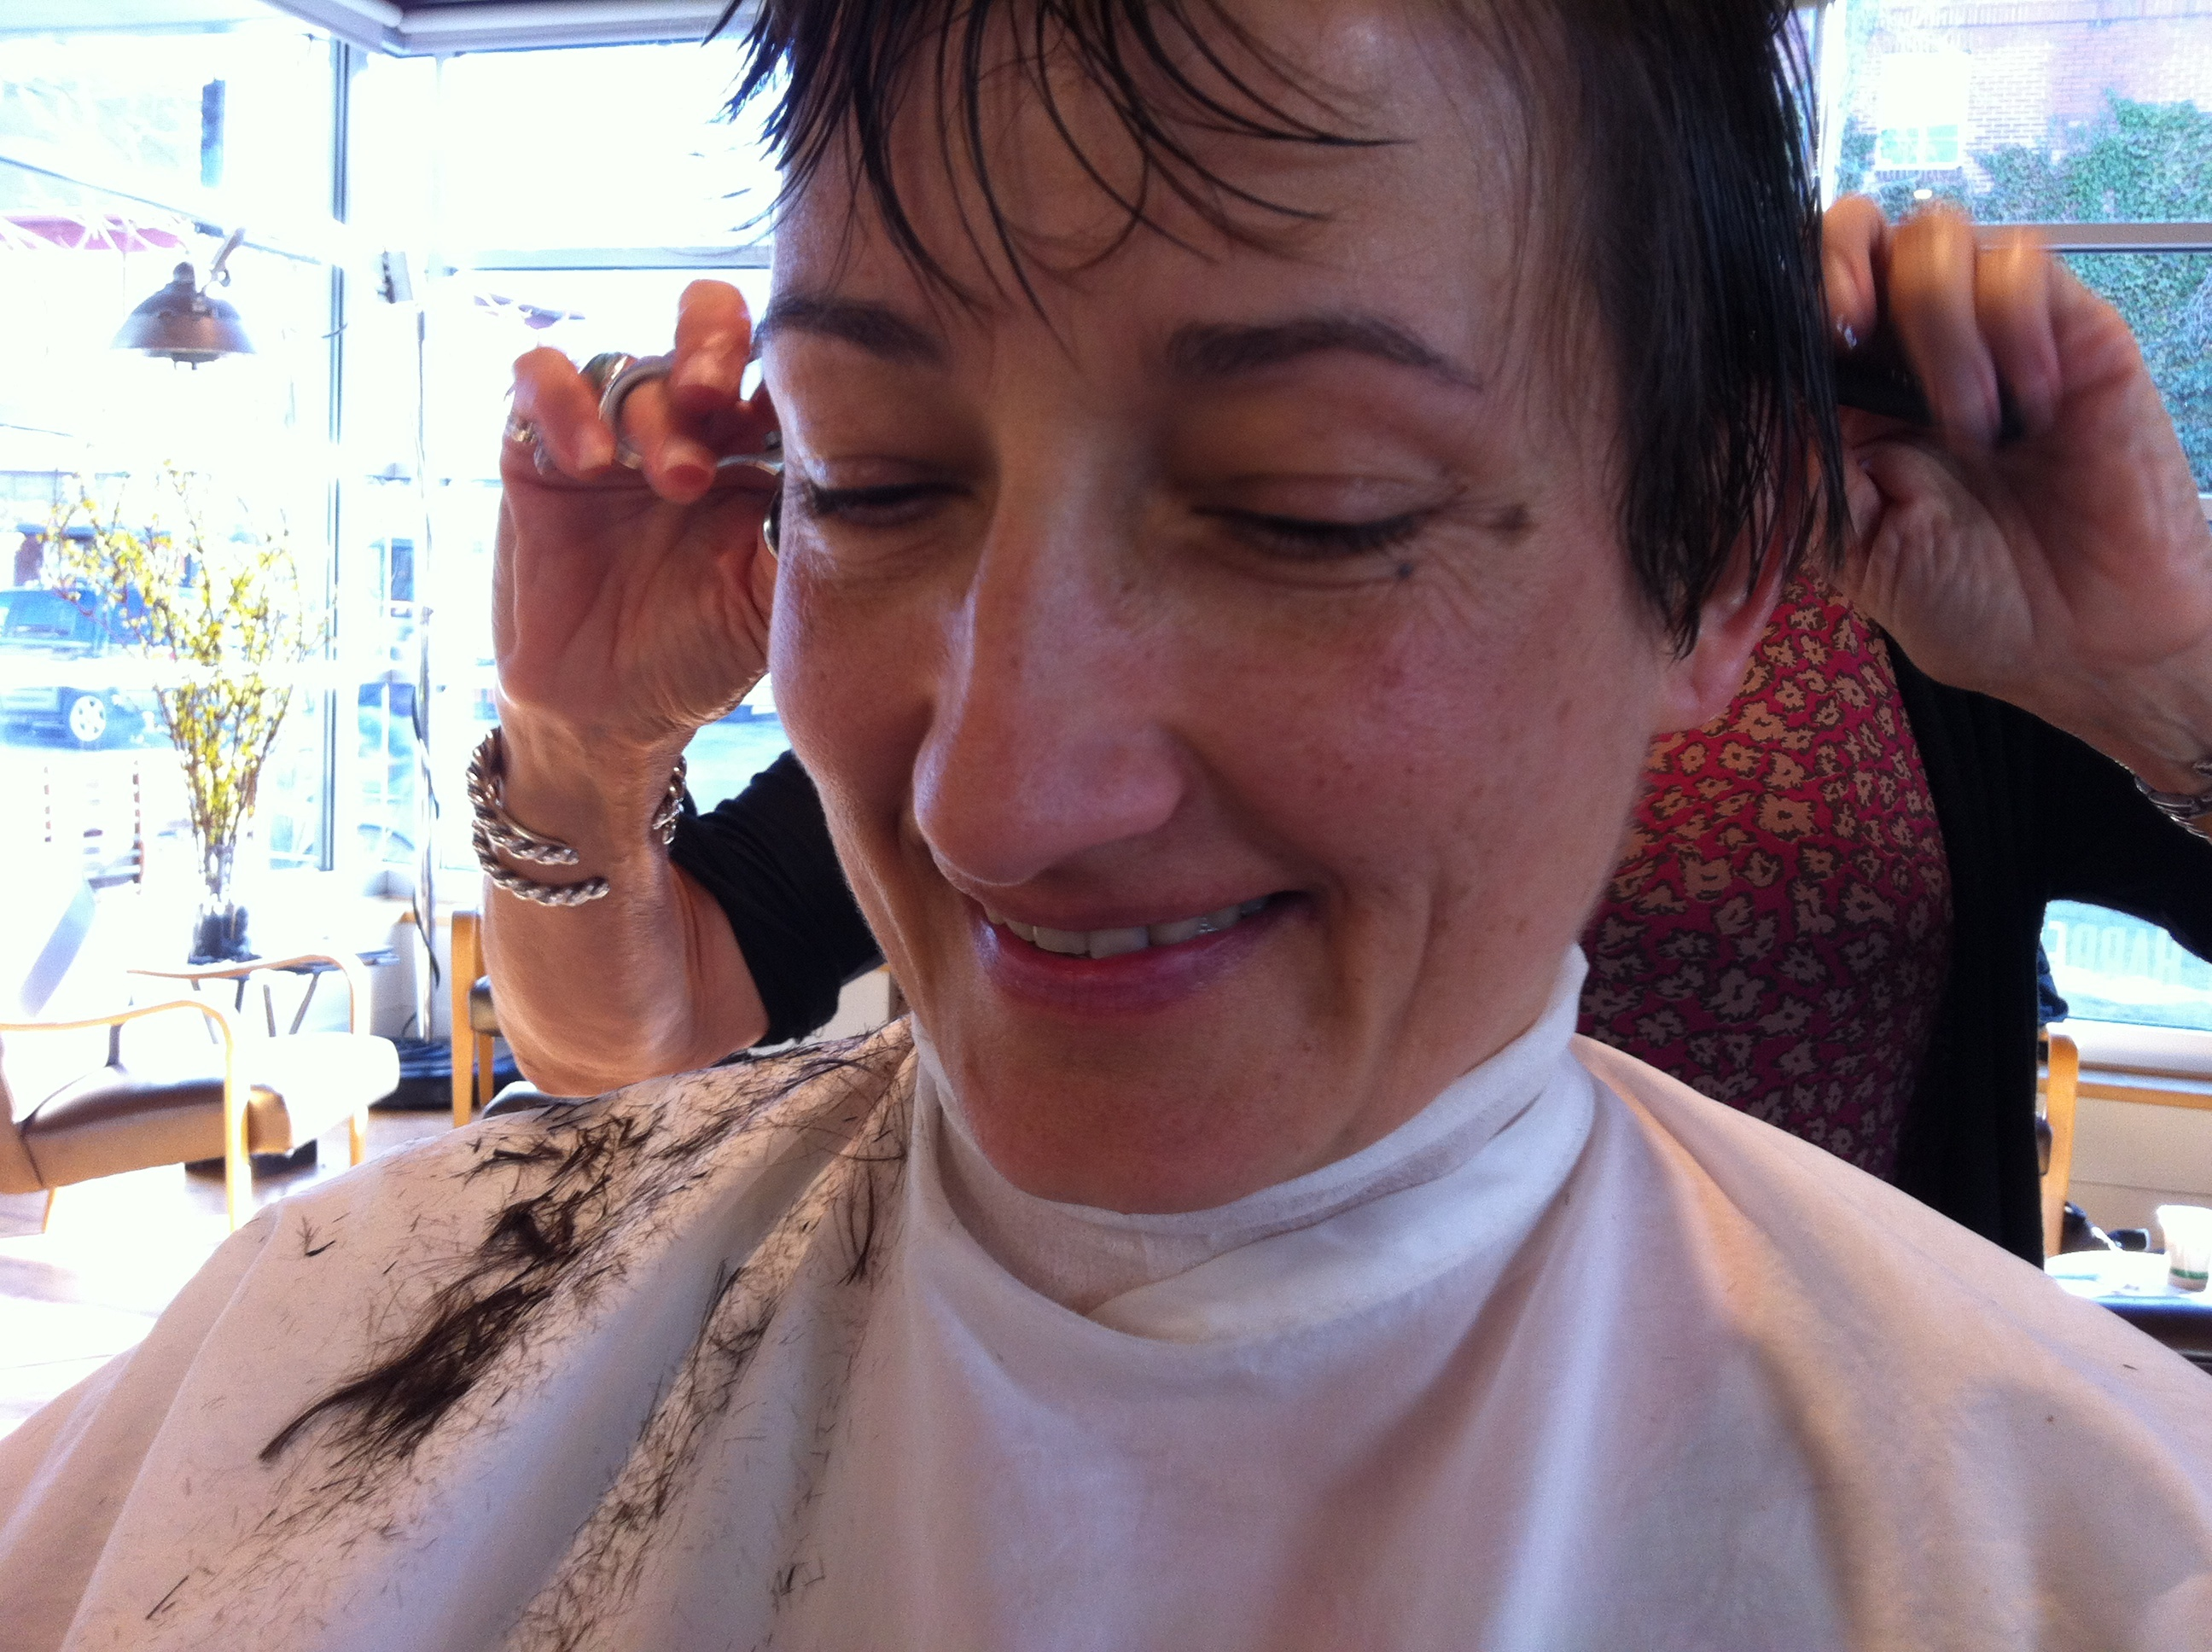 Beths Haircut  Front Fringe  Beth Partin Restore And Explore - Haircut missoula